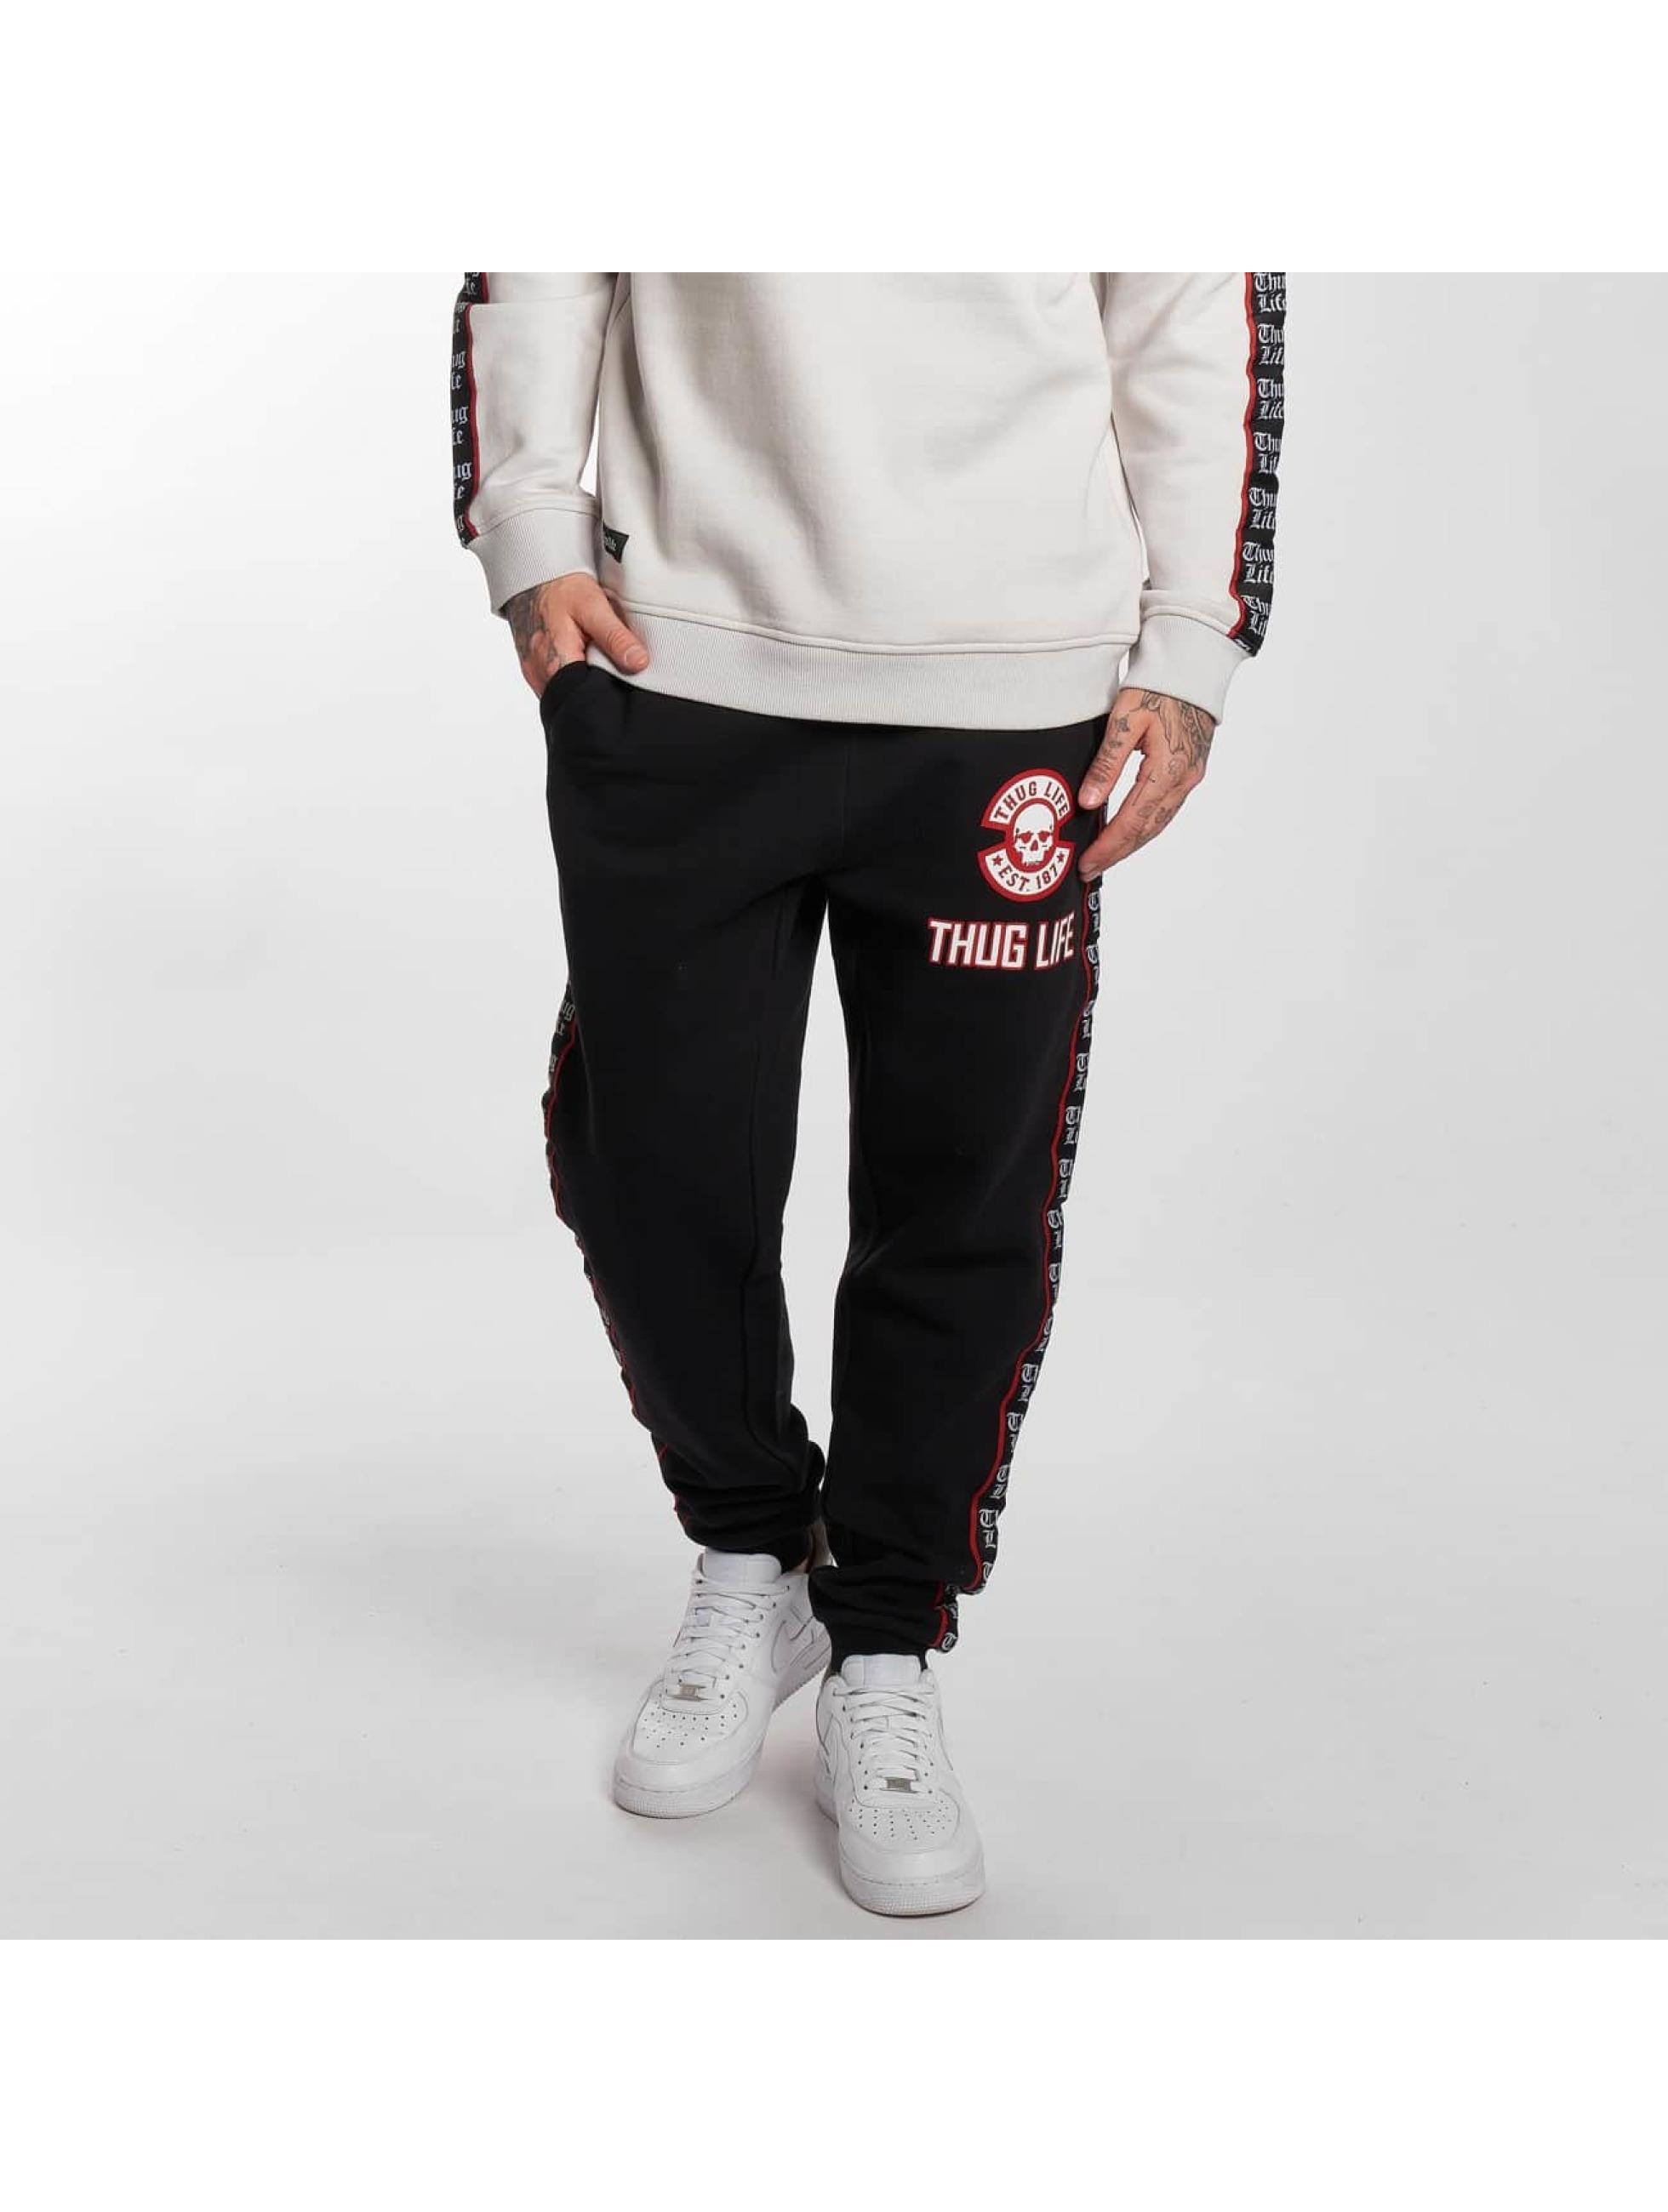 Thug Life / Sweat Pant Lux in black XL